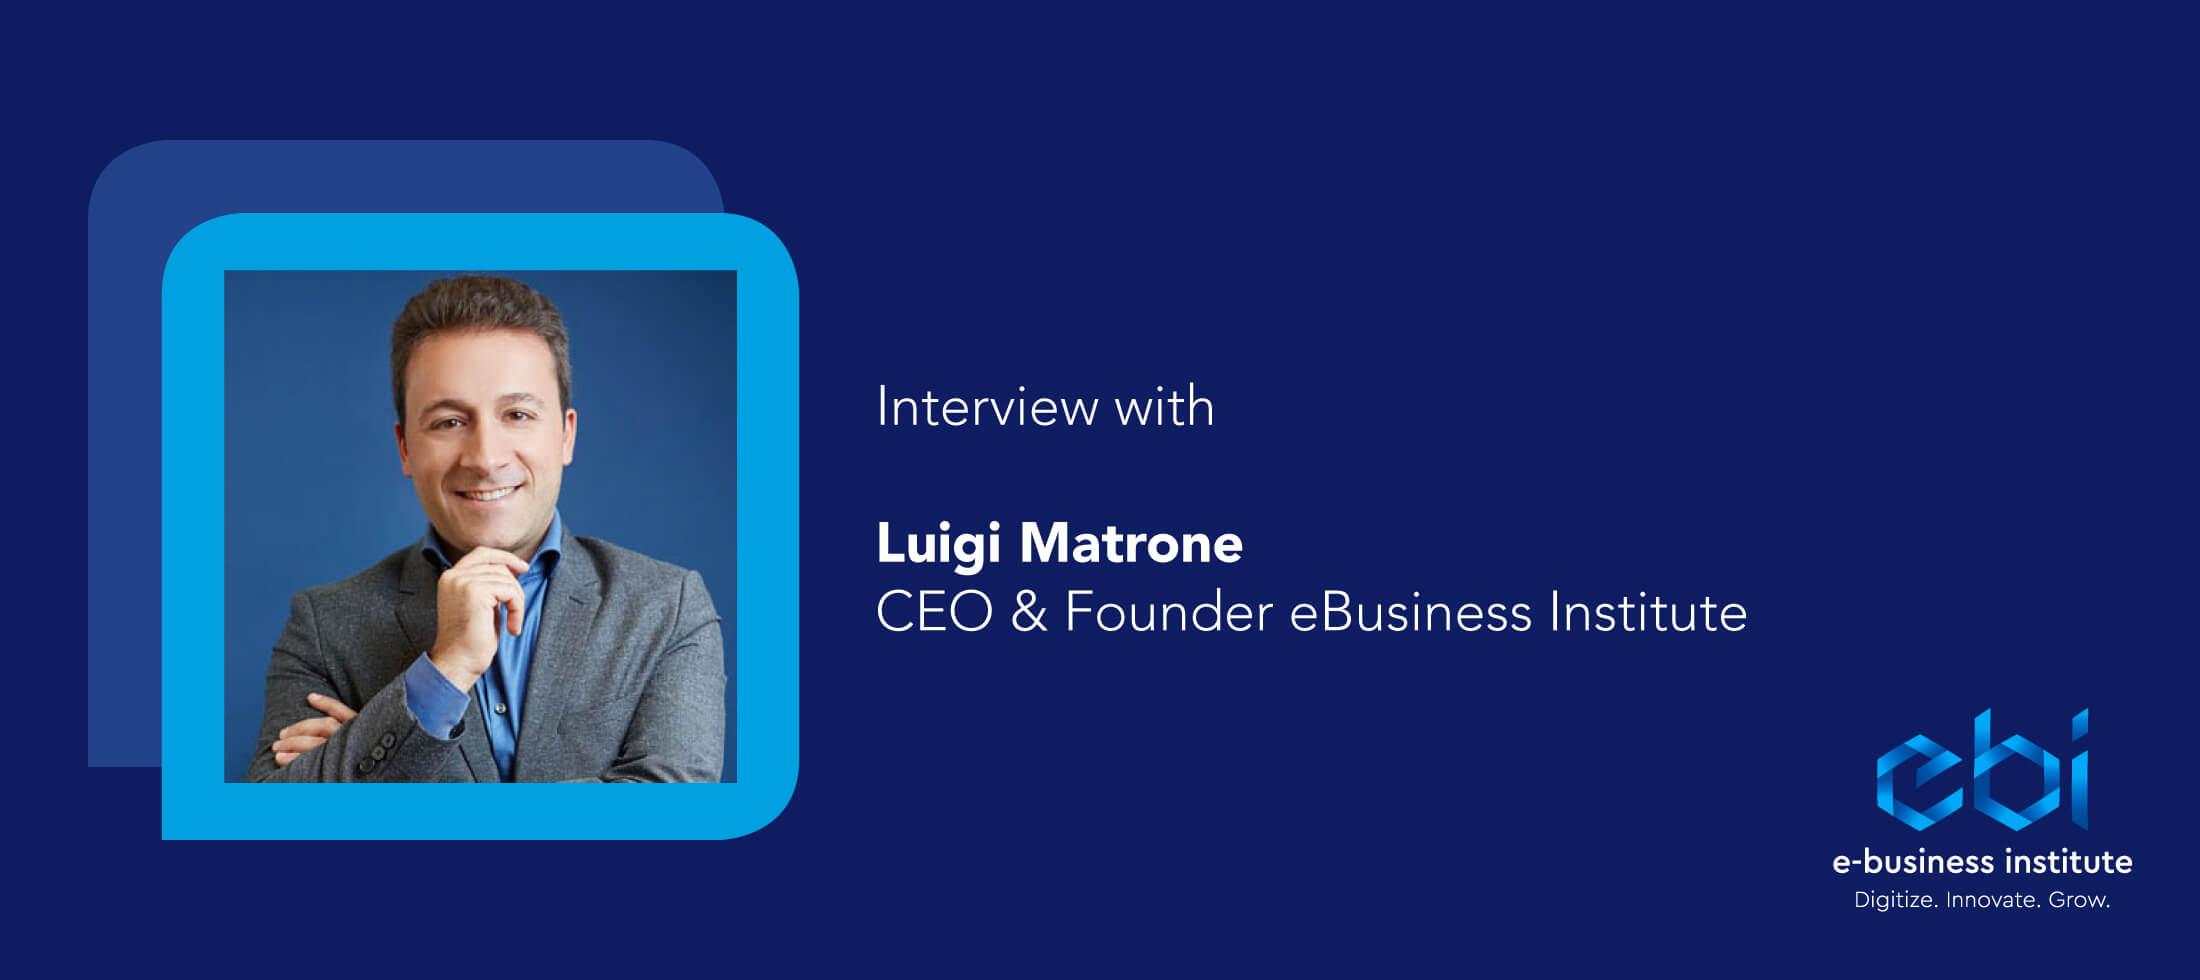 Luigi Matrone interview Wonderflow Hero Image